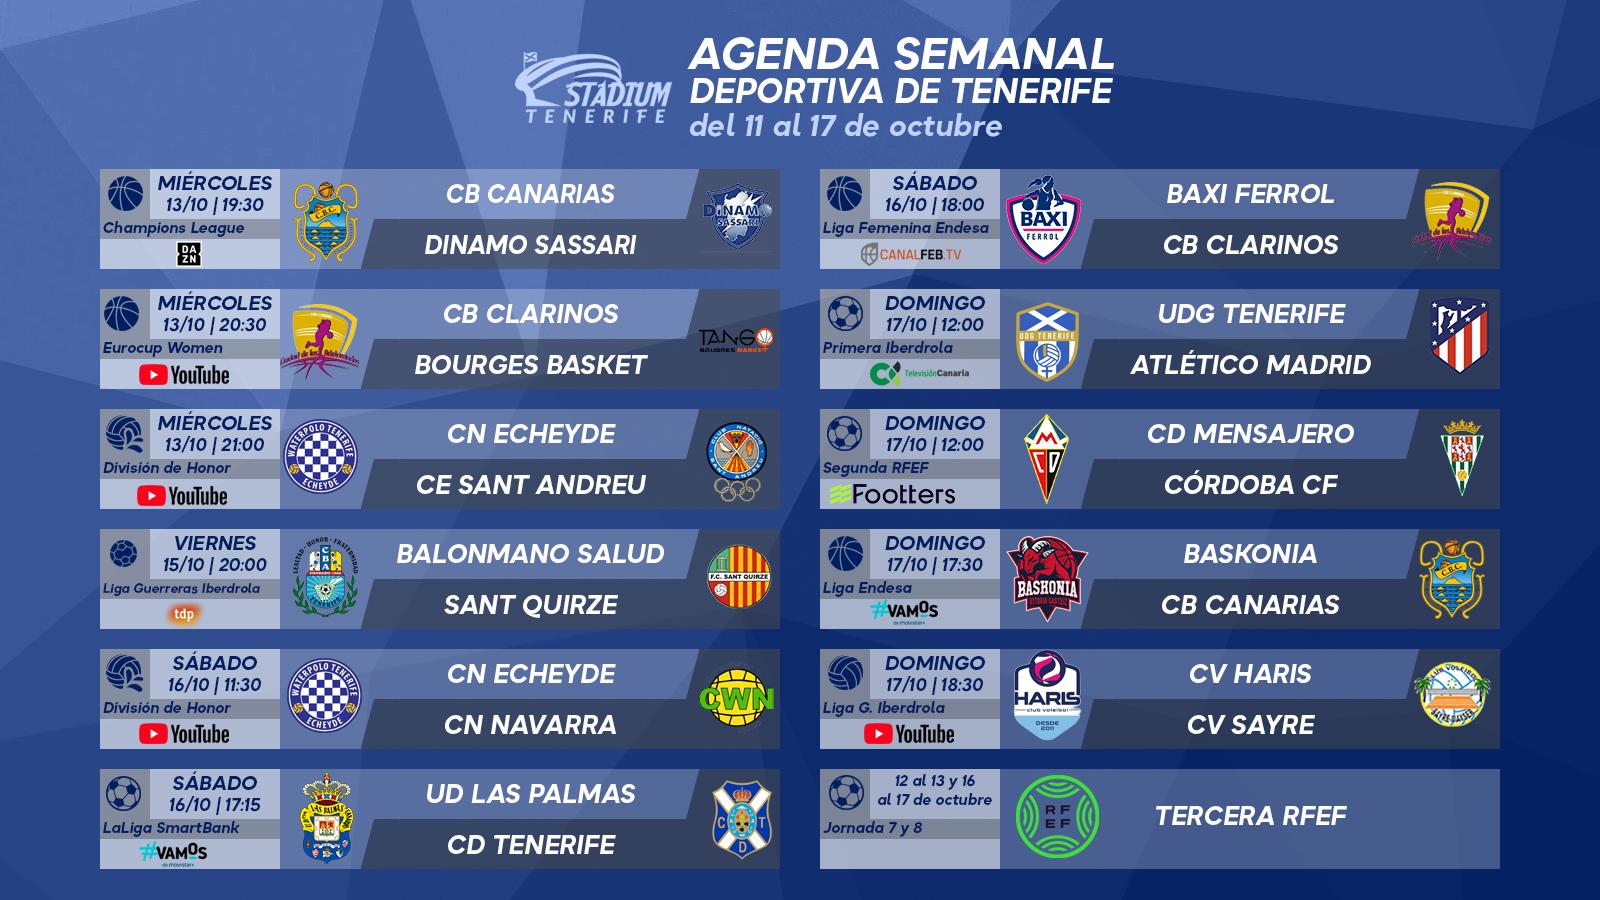 Agenda Semanal Deportiva de Tenerife (11 al 17 de octubre de 2021)